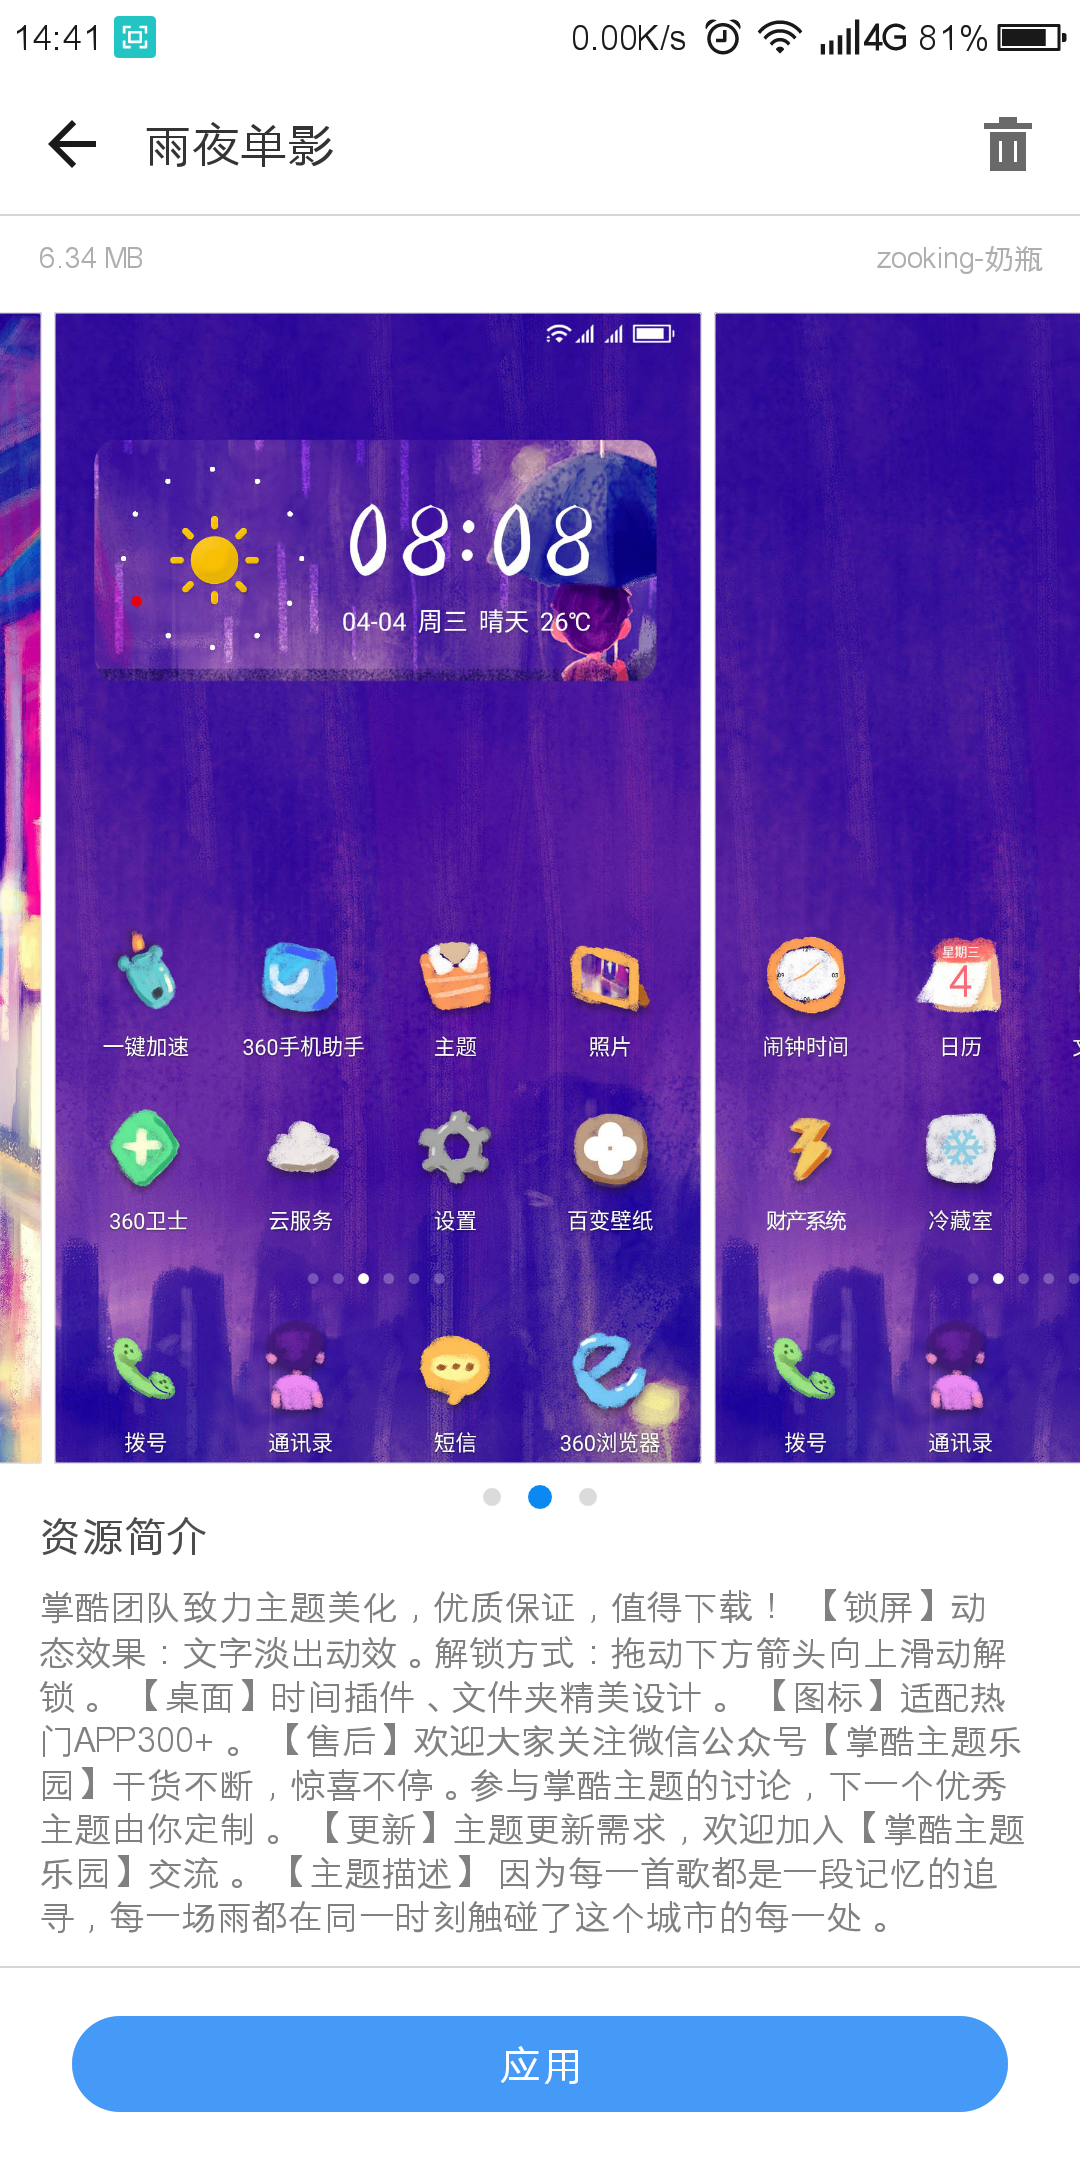 Screenshot_2018-10-30-14-41-20.png